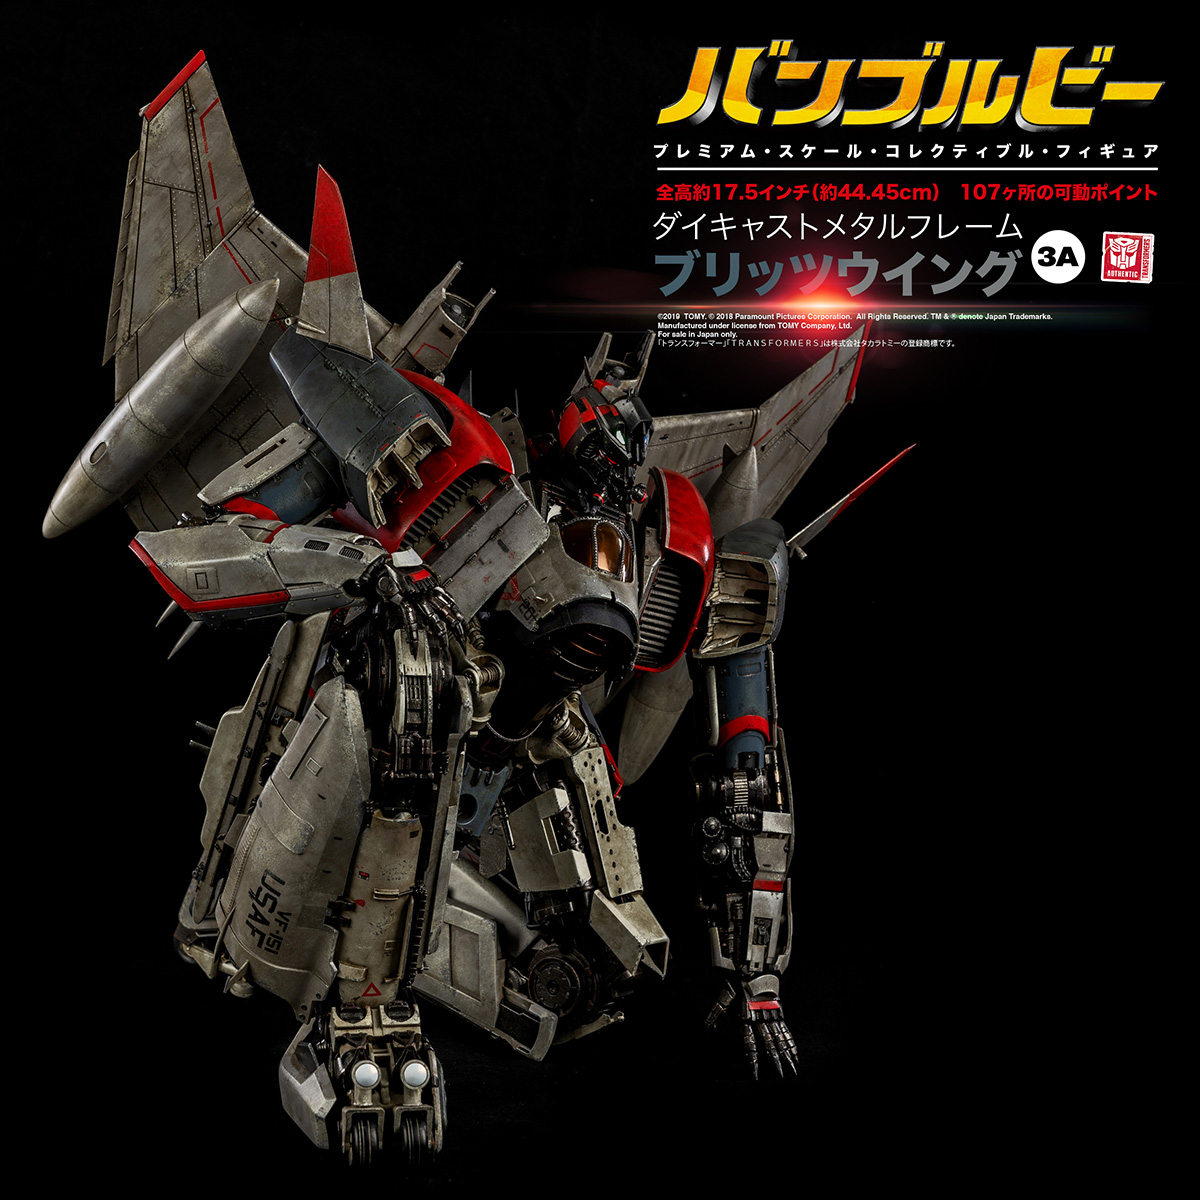 Blitzwing_PM_JAP_1119.jpg